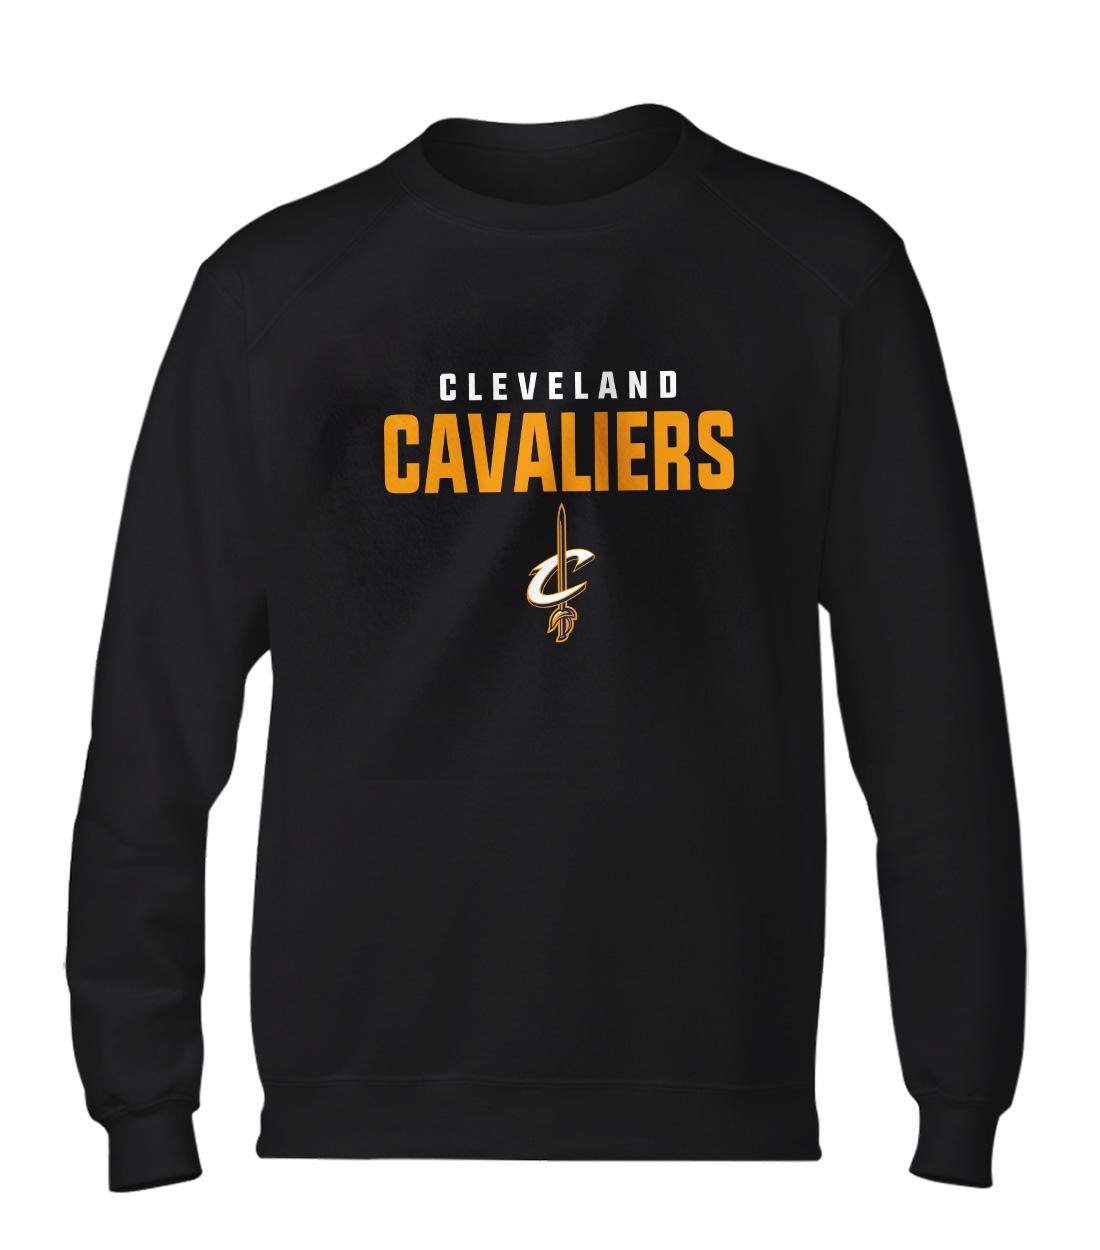 Cleveland Cavaliers Basic (BSC-BLC-NP-62-NBA-CLE-CAVS.FLAT)